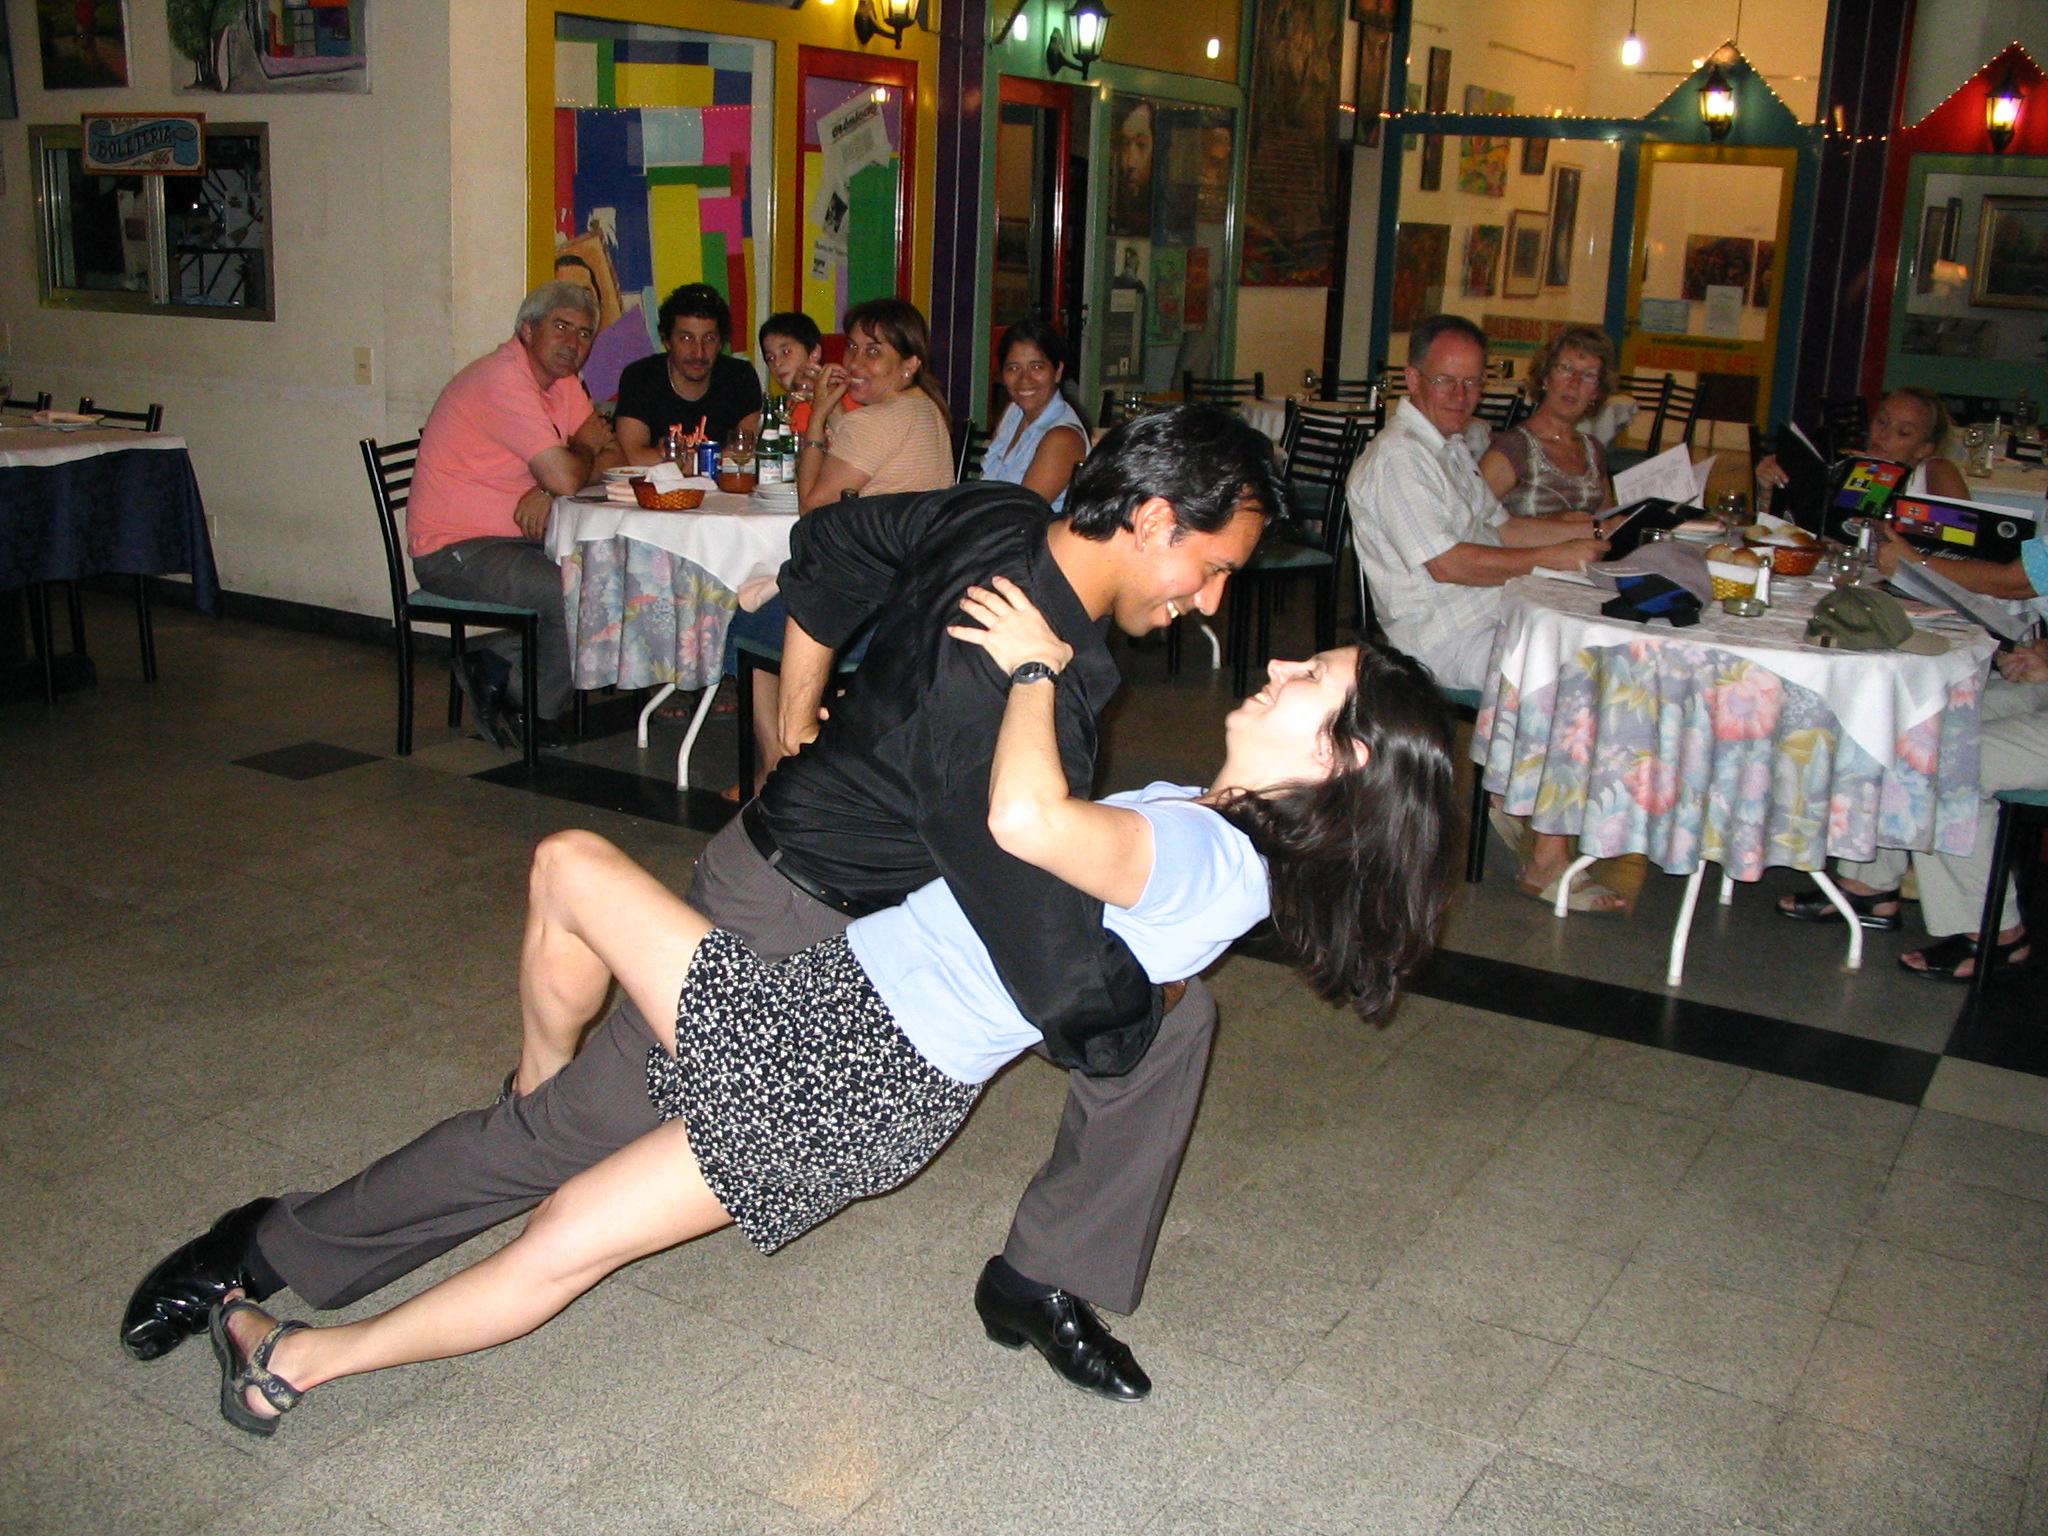 Impromptu tango